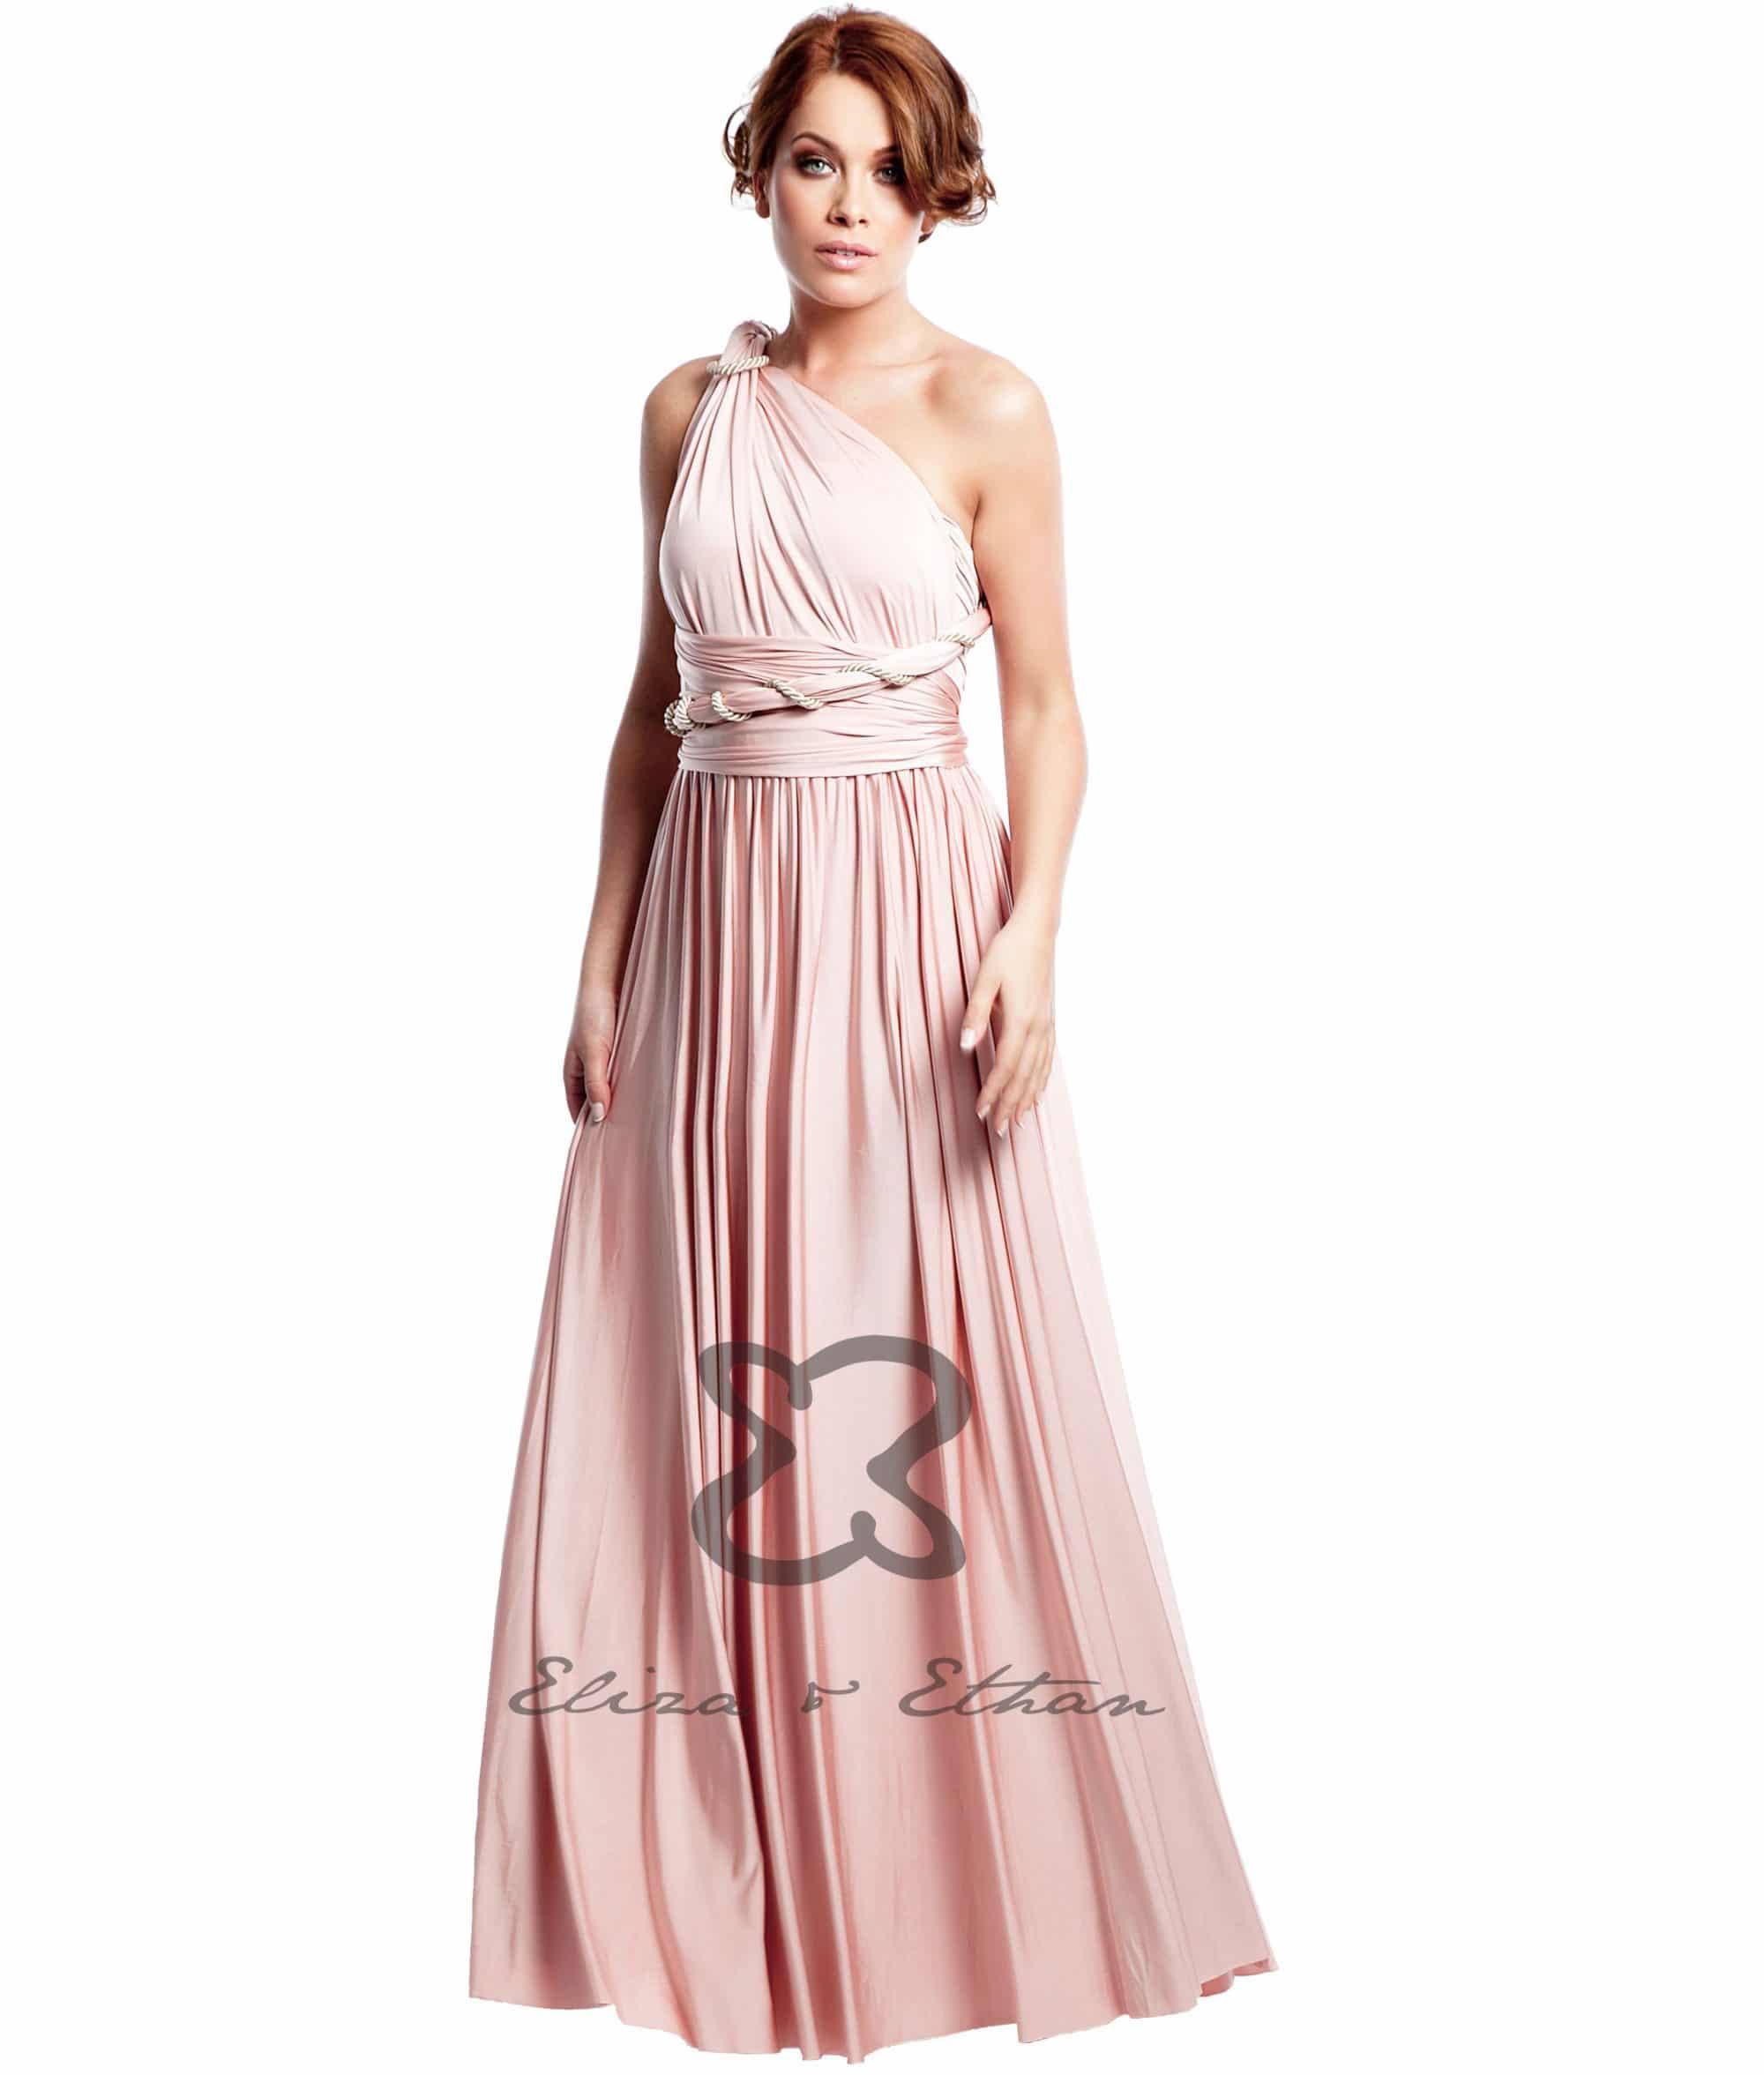 Eliza & Ethan Dusty Rose Multiwrap Dress Alila